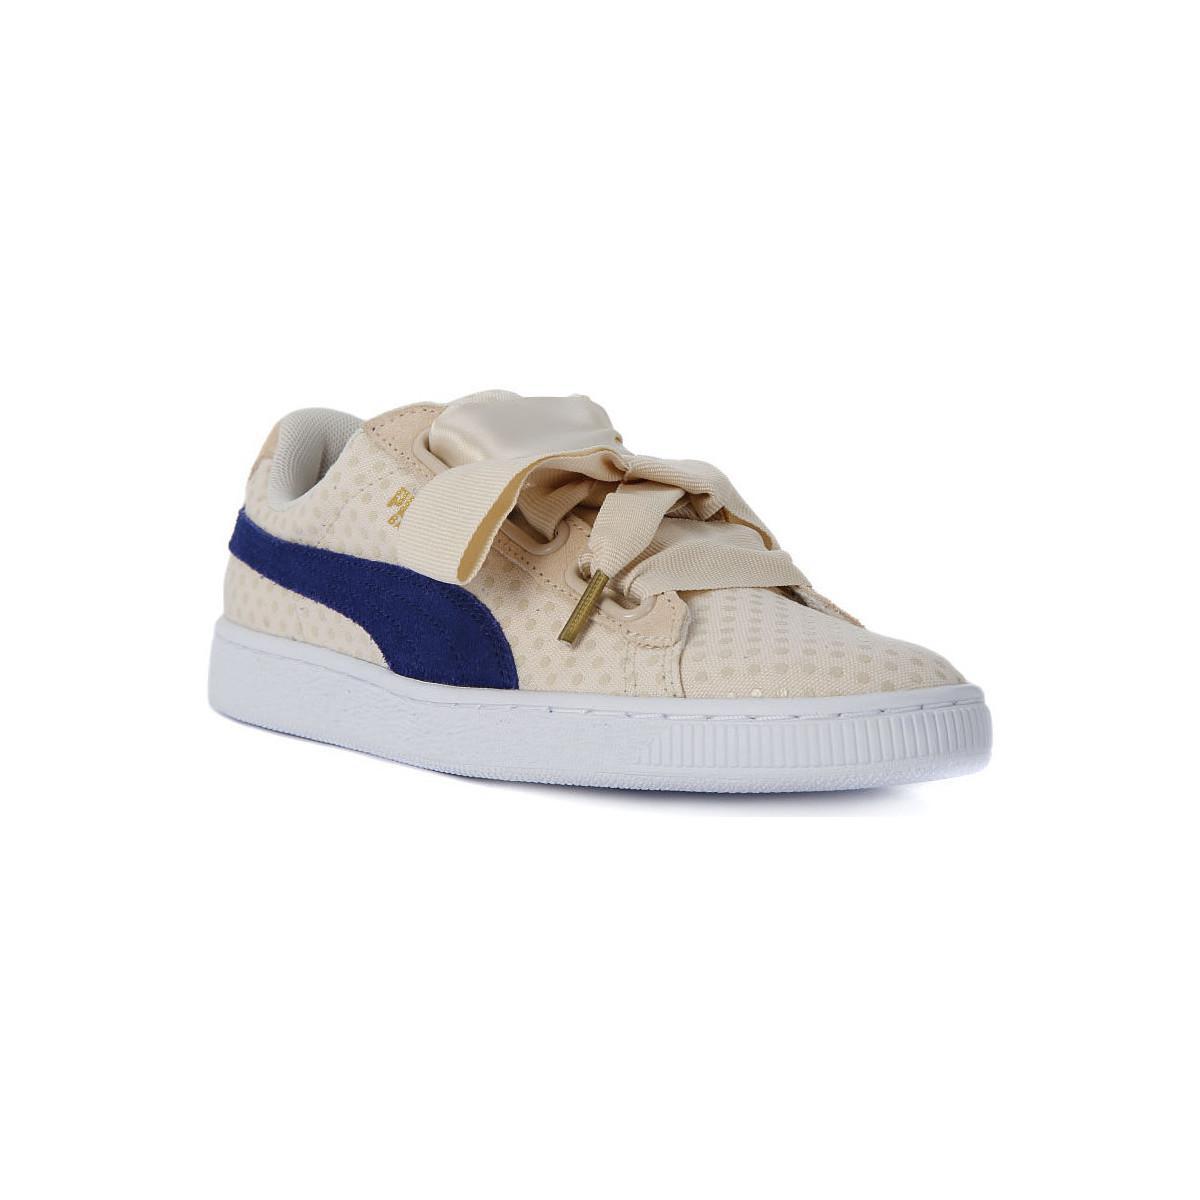 online store eb155 ada83 PUMA Basket Heart Denim Women's Shoes (trainers) In Blue in ...